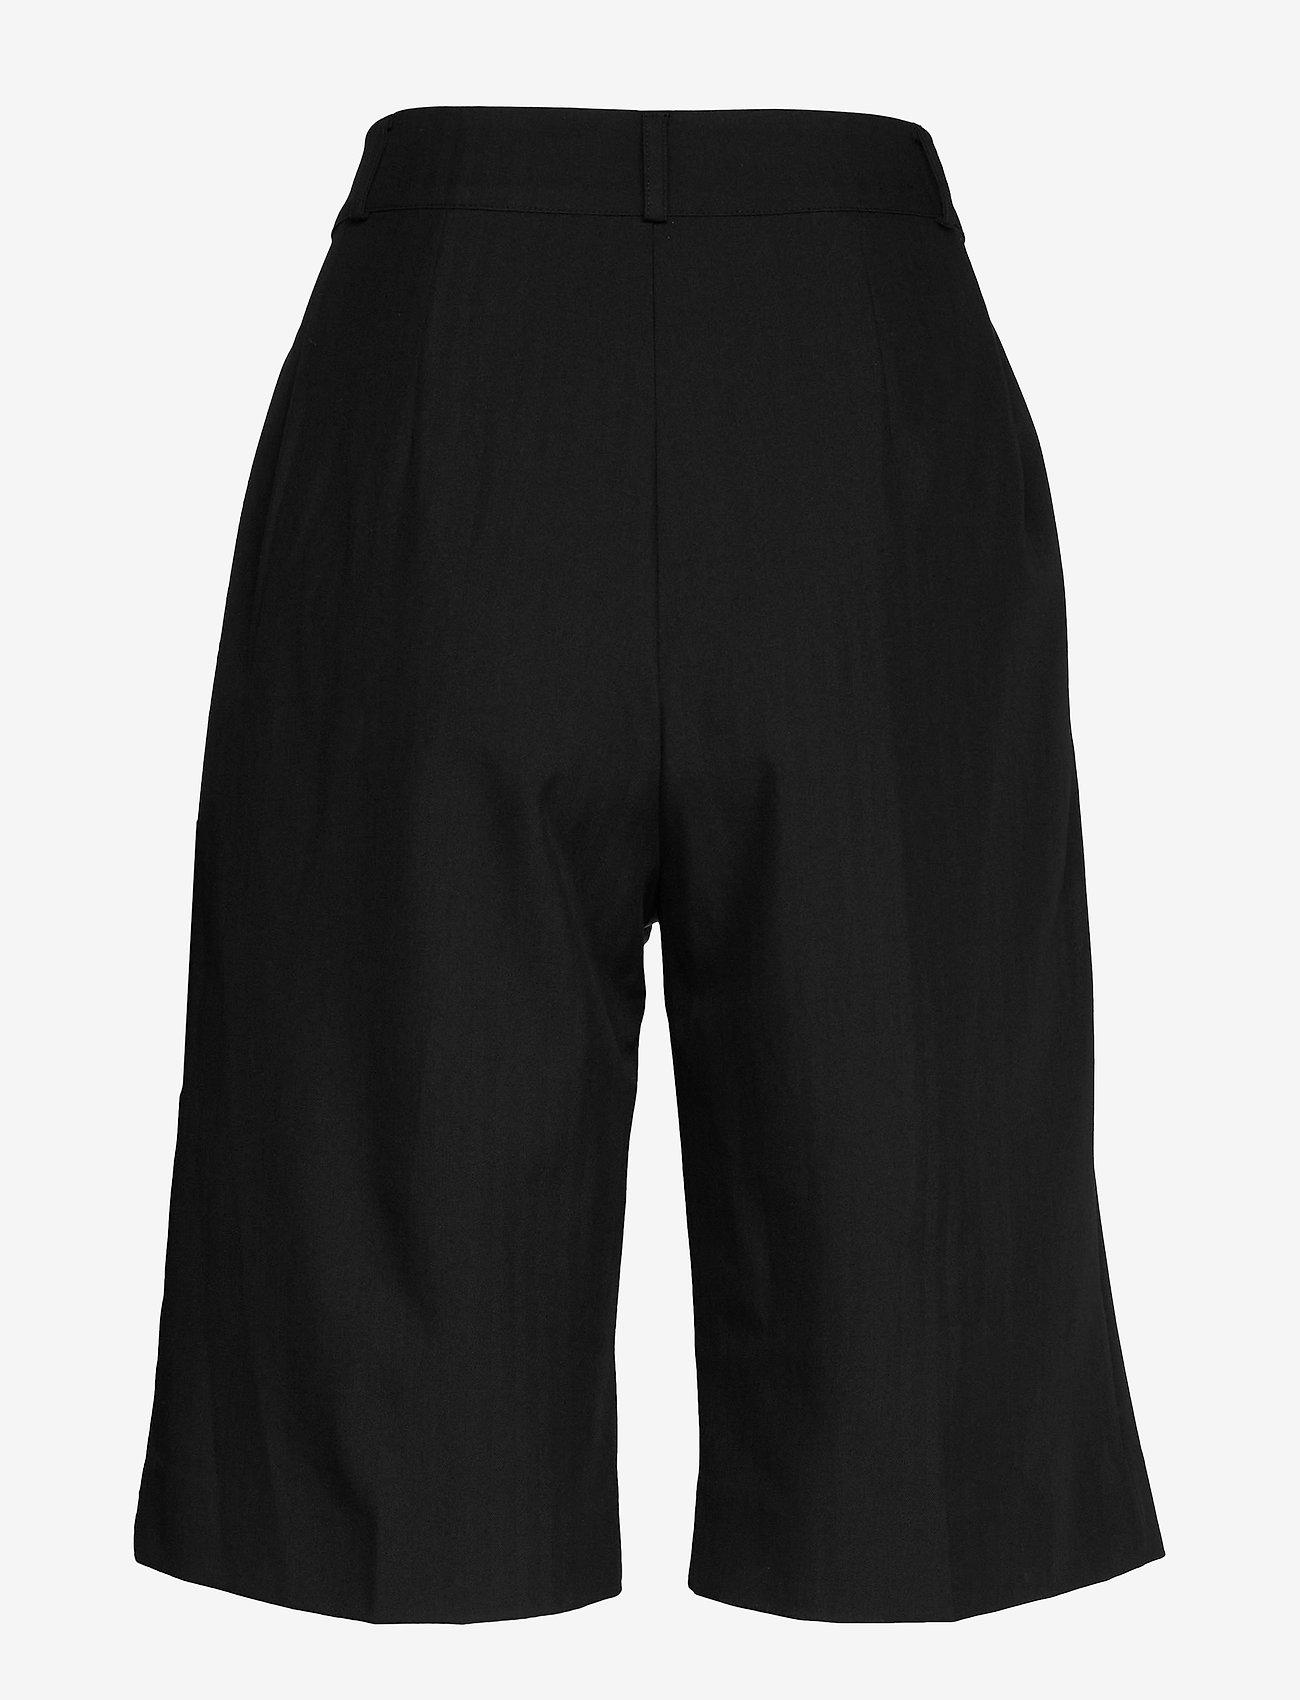 Envii Enretna Shorts 6726 - Black